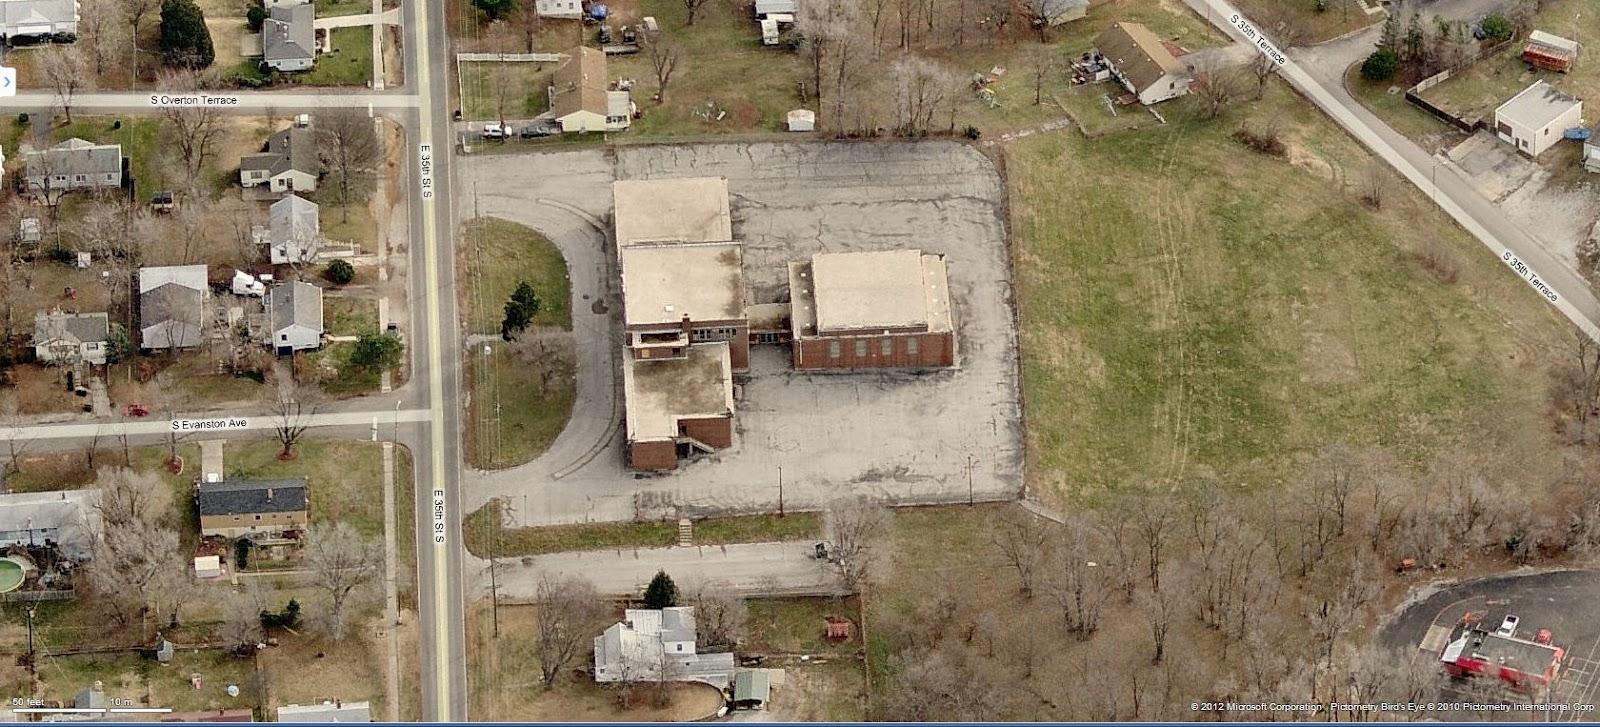 Capt  Spaulding's World: Fire Companies Return to Former Elementary